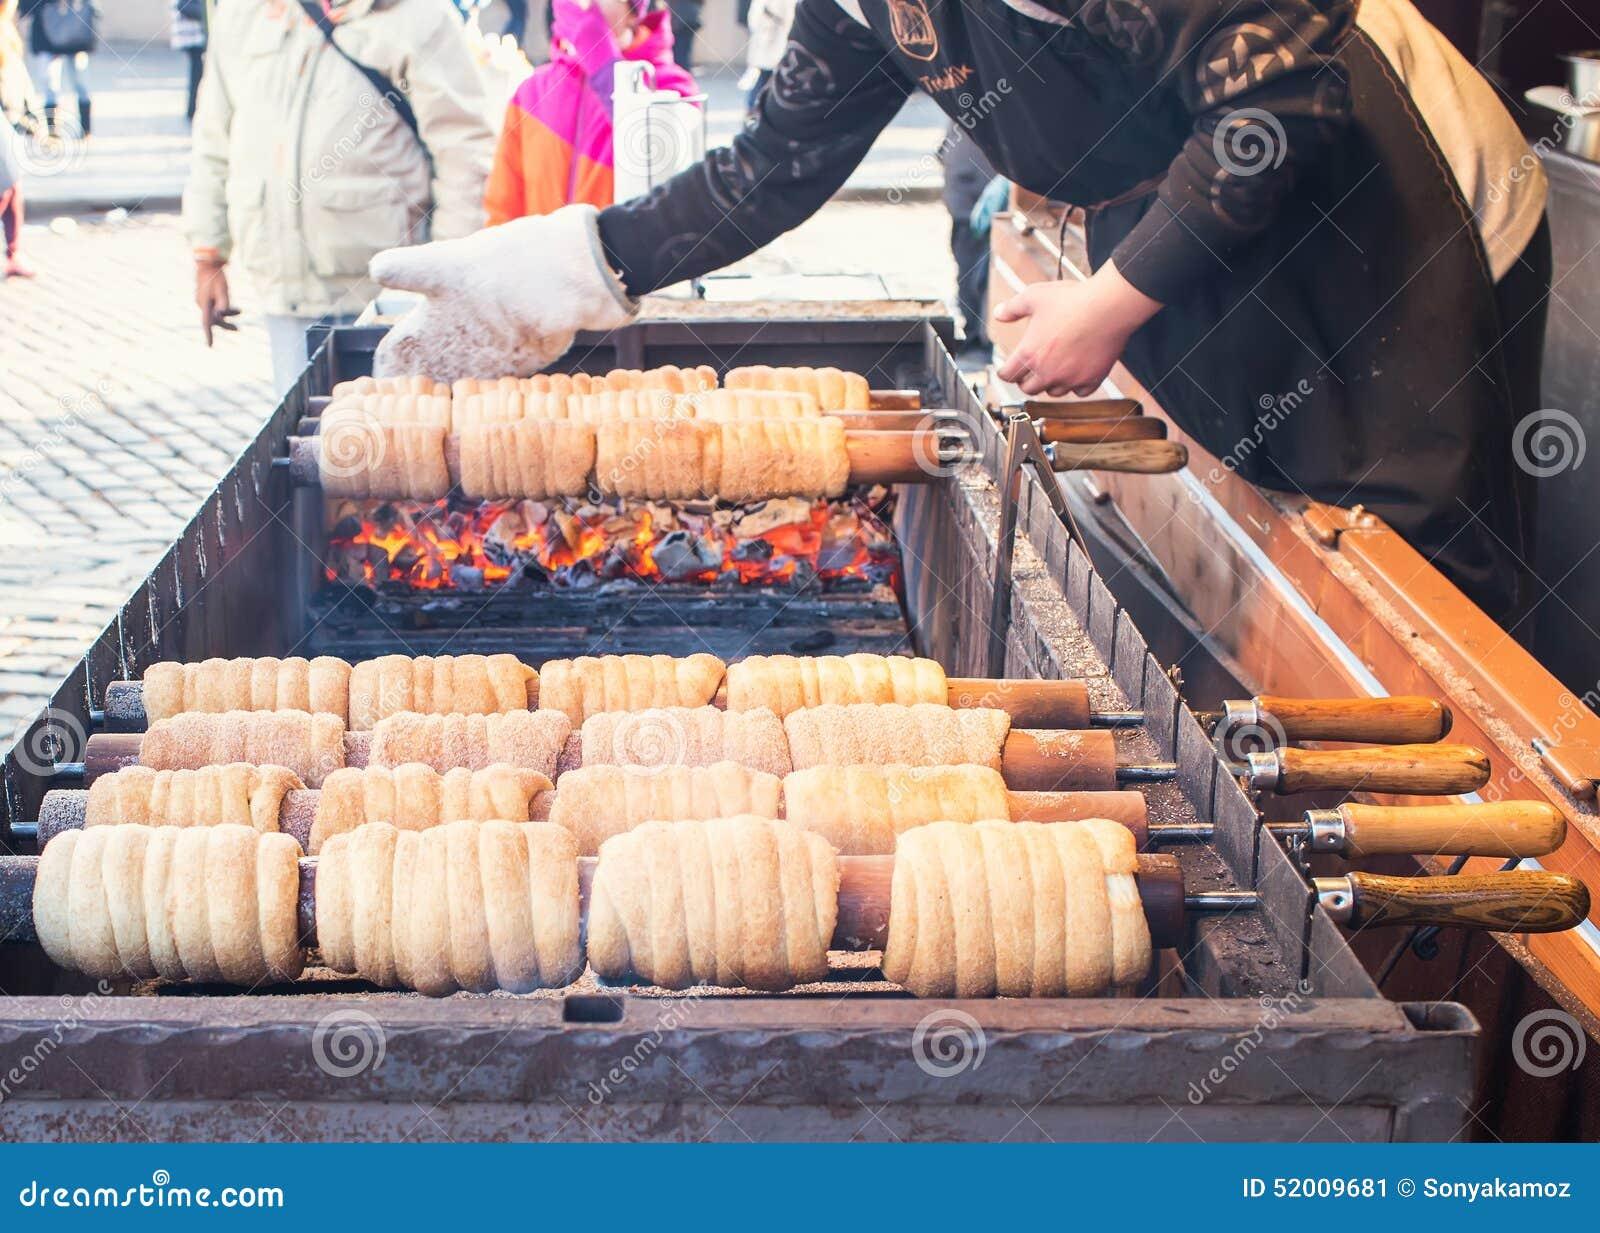 Czech National Winter Street Food Called Trdlo Trdelnic